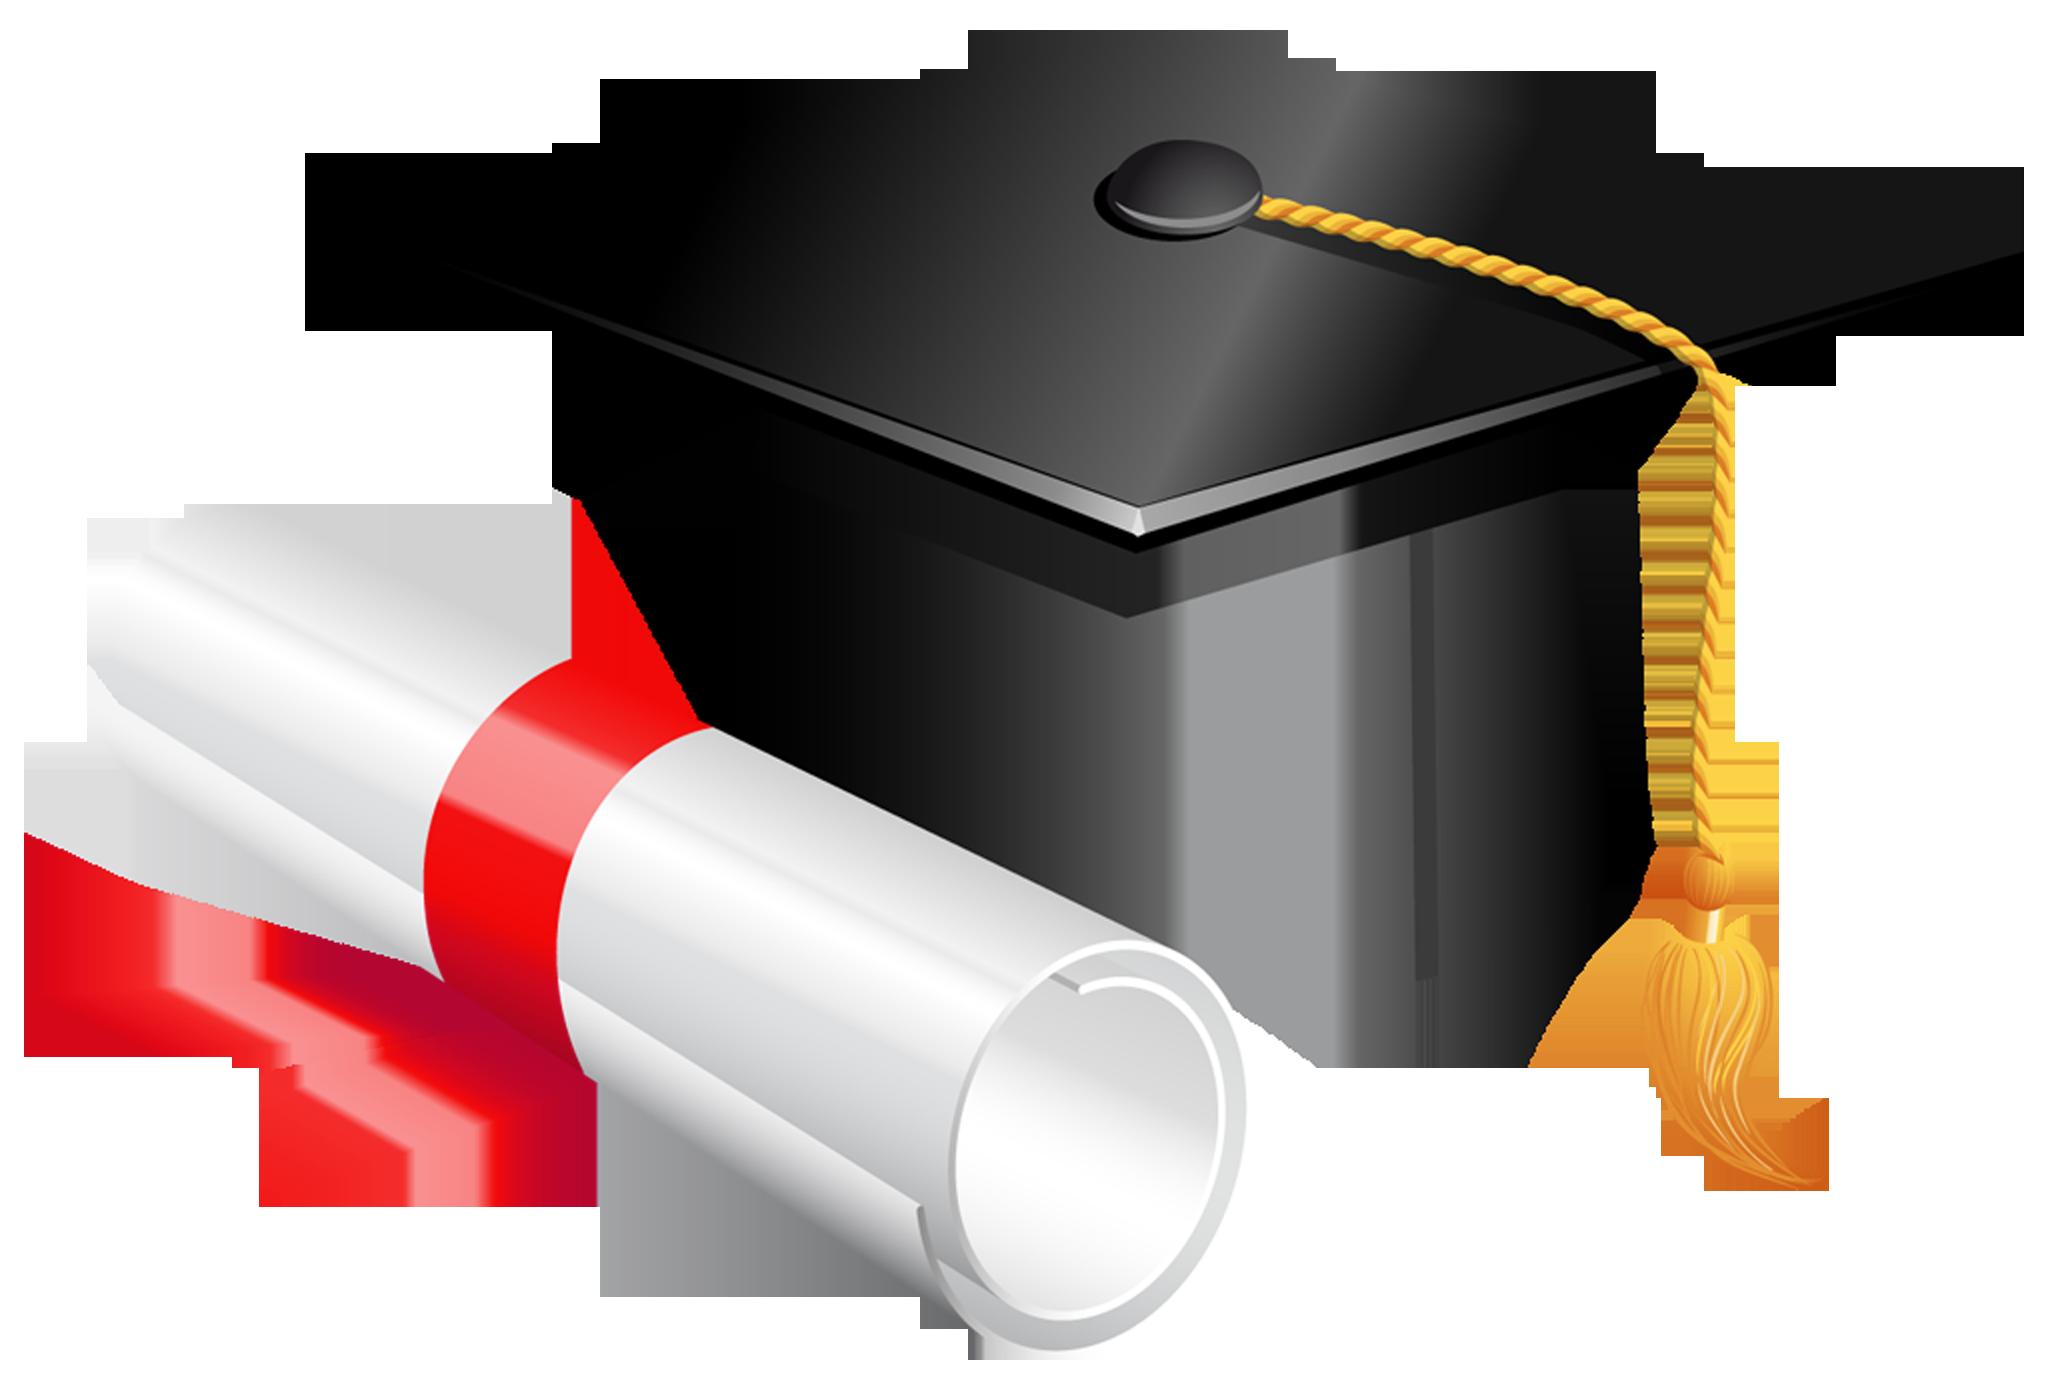 Arch clipart graduation Full Diploma Cap PNG size